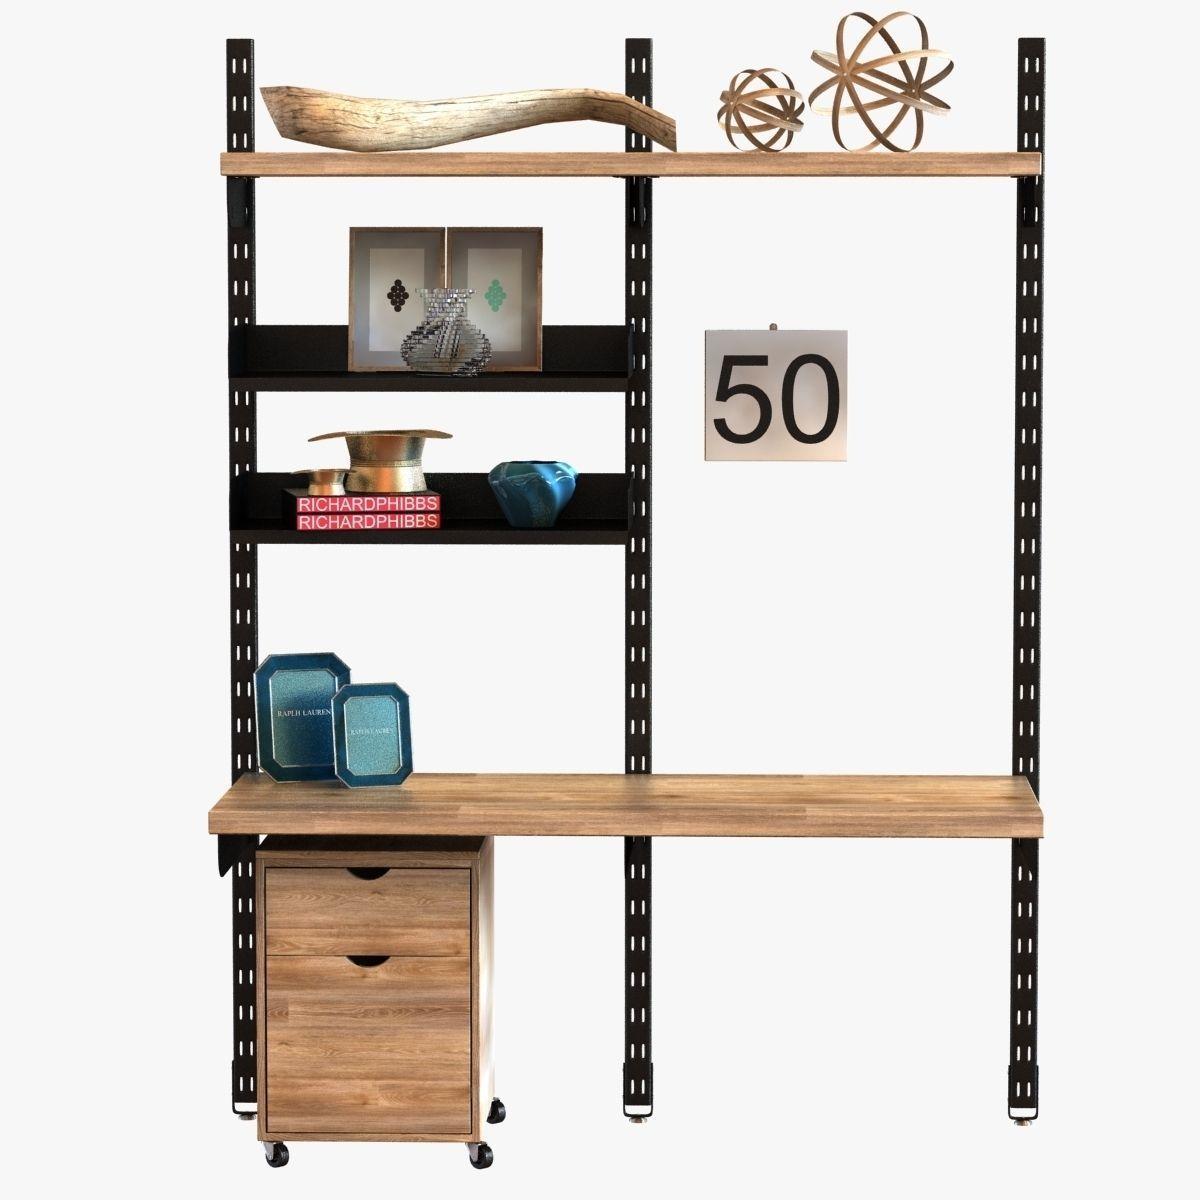 Design Workshop Modular Wall Storage System 3d Model Max